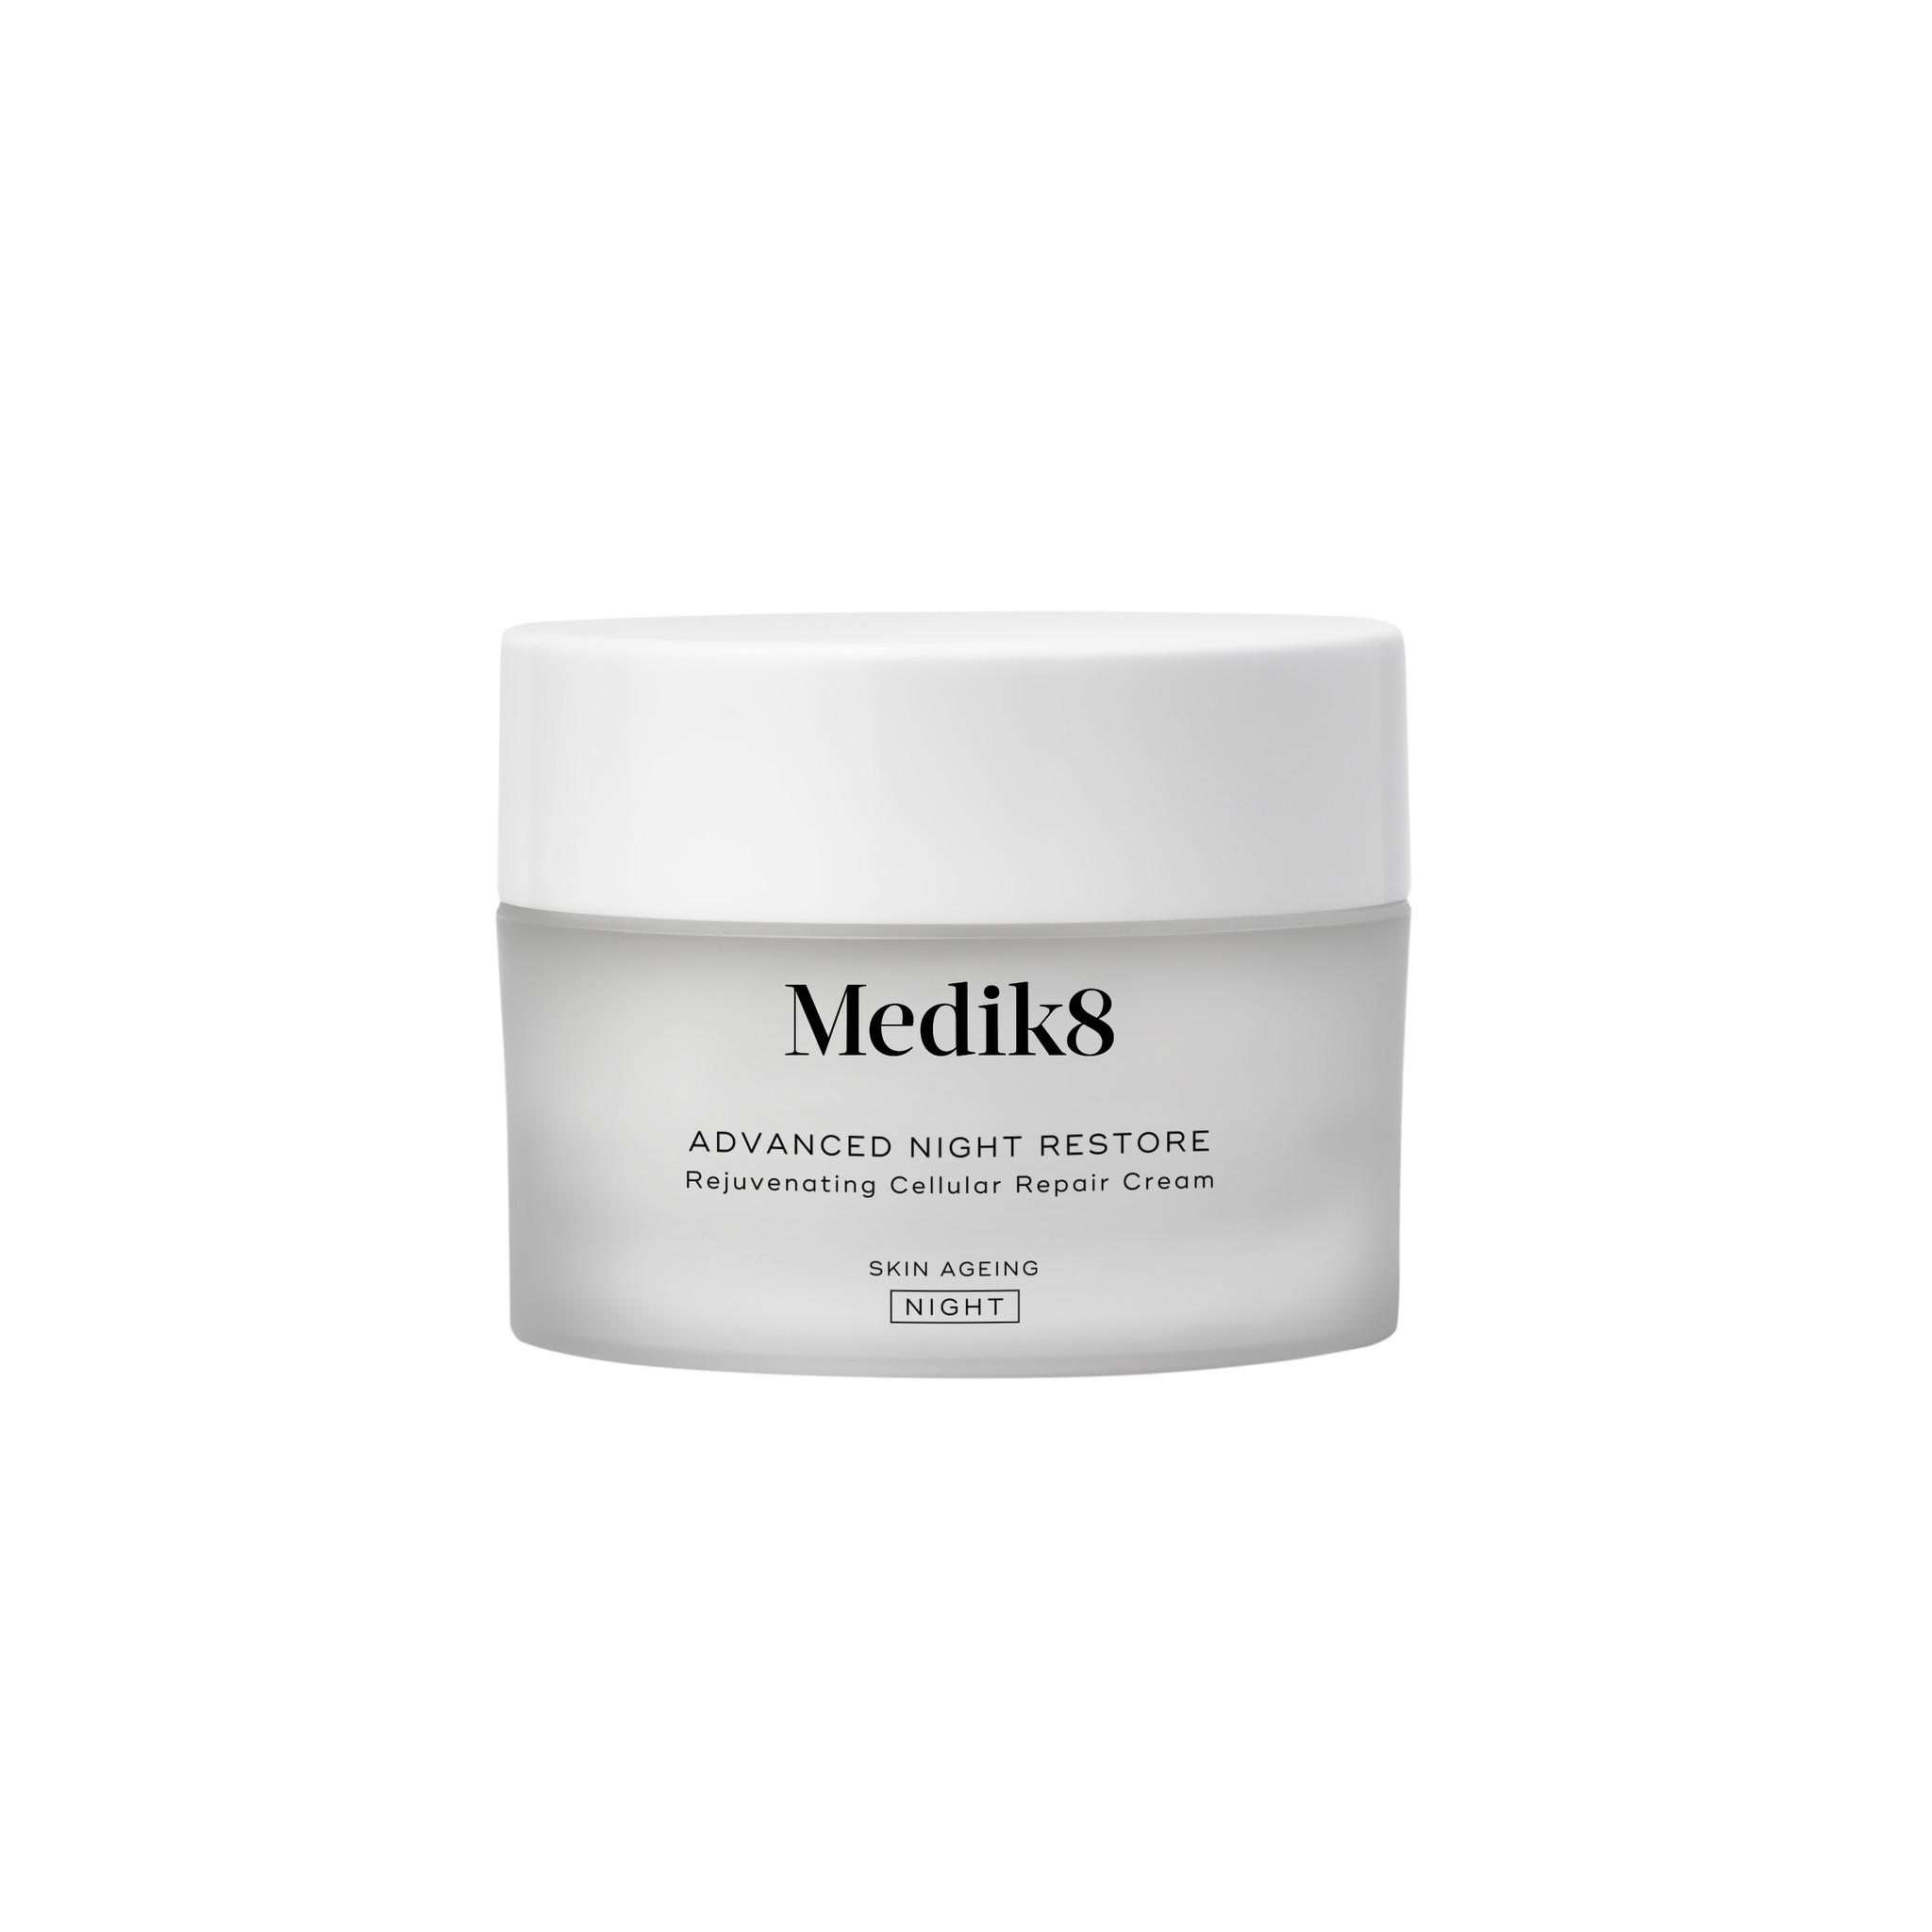 Medik8 Medik8 Try me Size: Advanced Night Restore (12,5 ml)